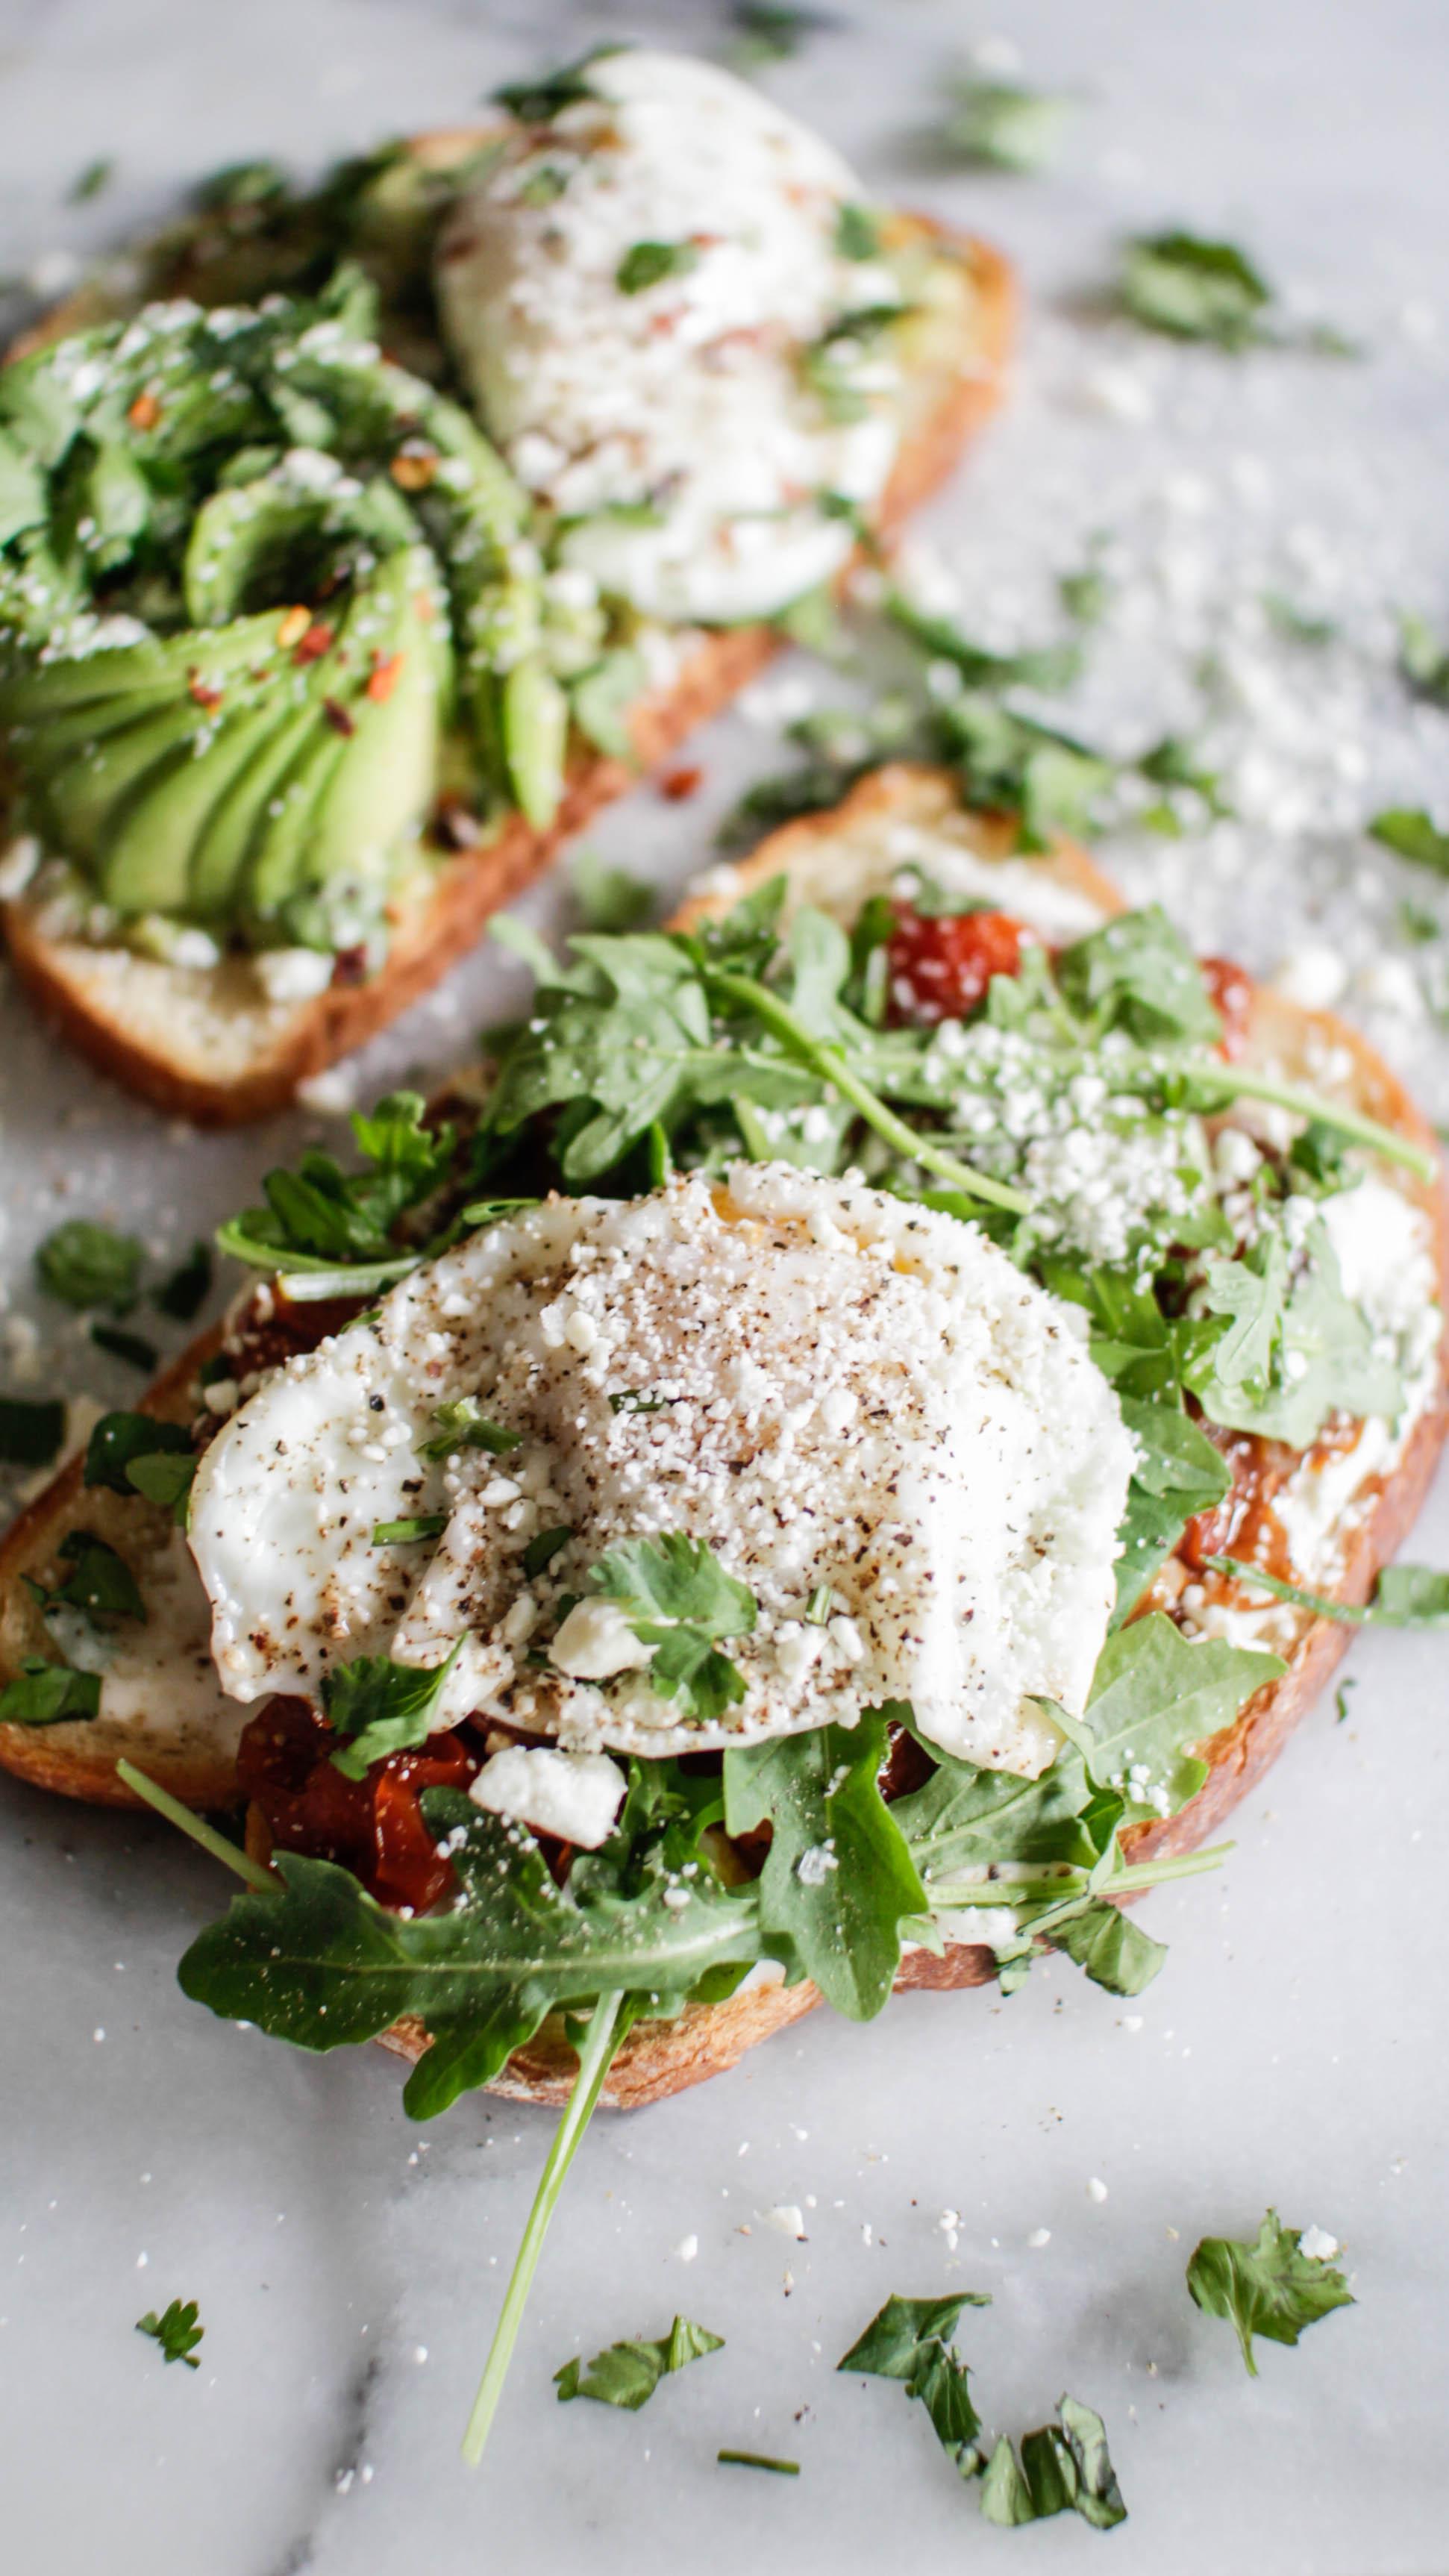 Egg and Toast Breakfast Recipe